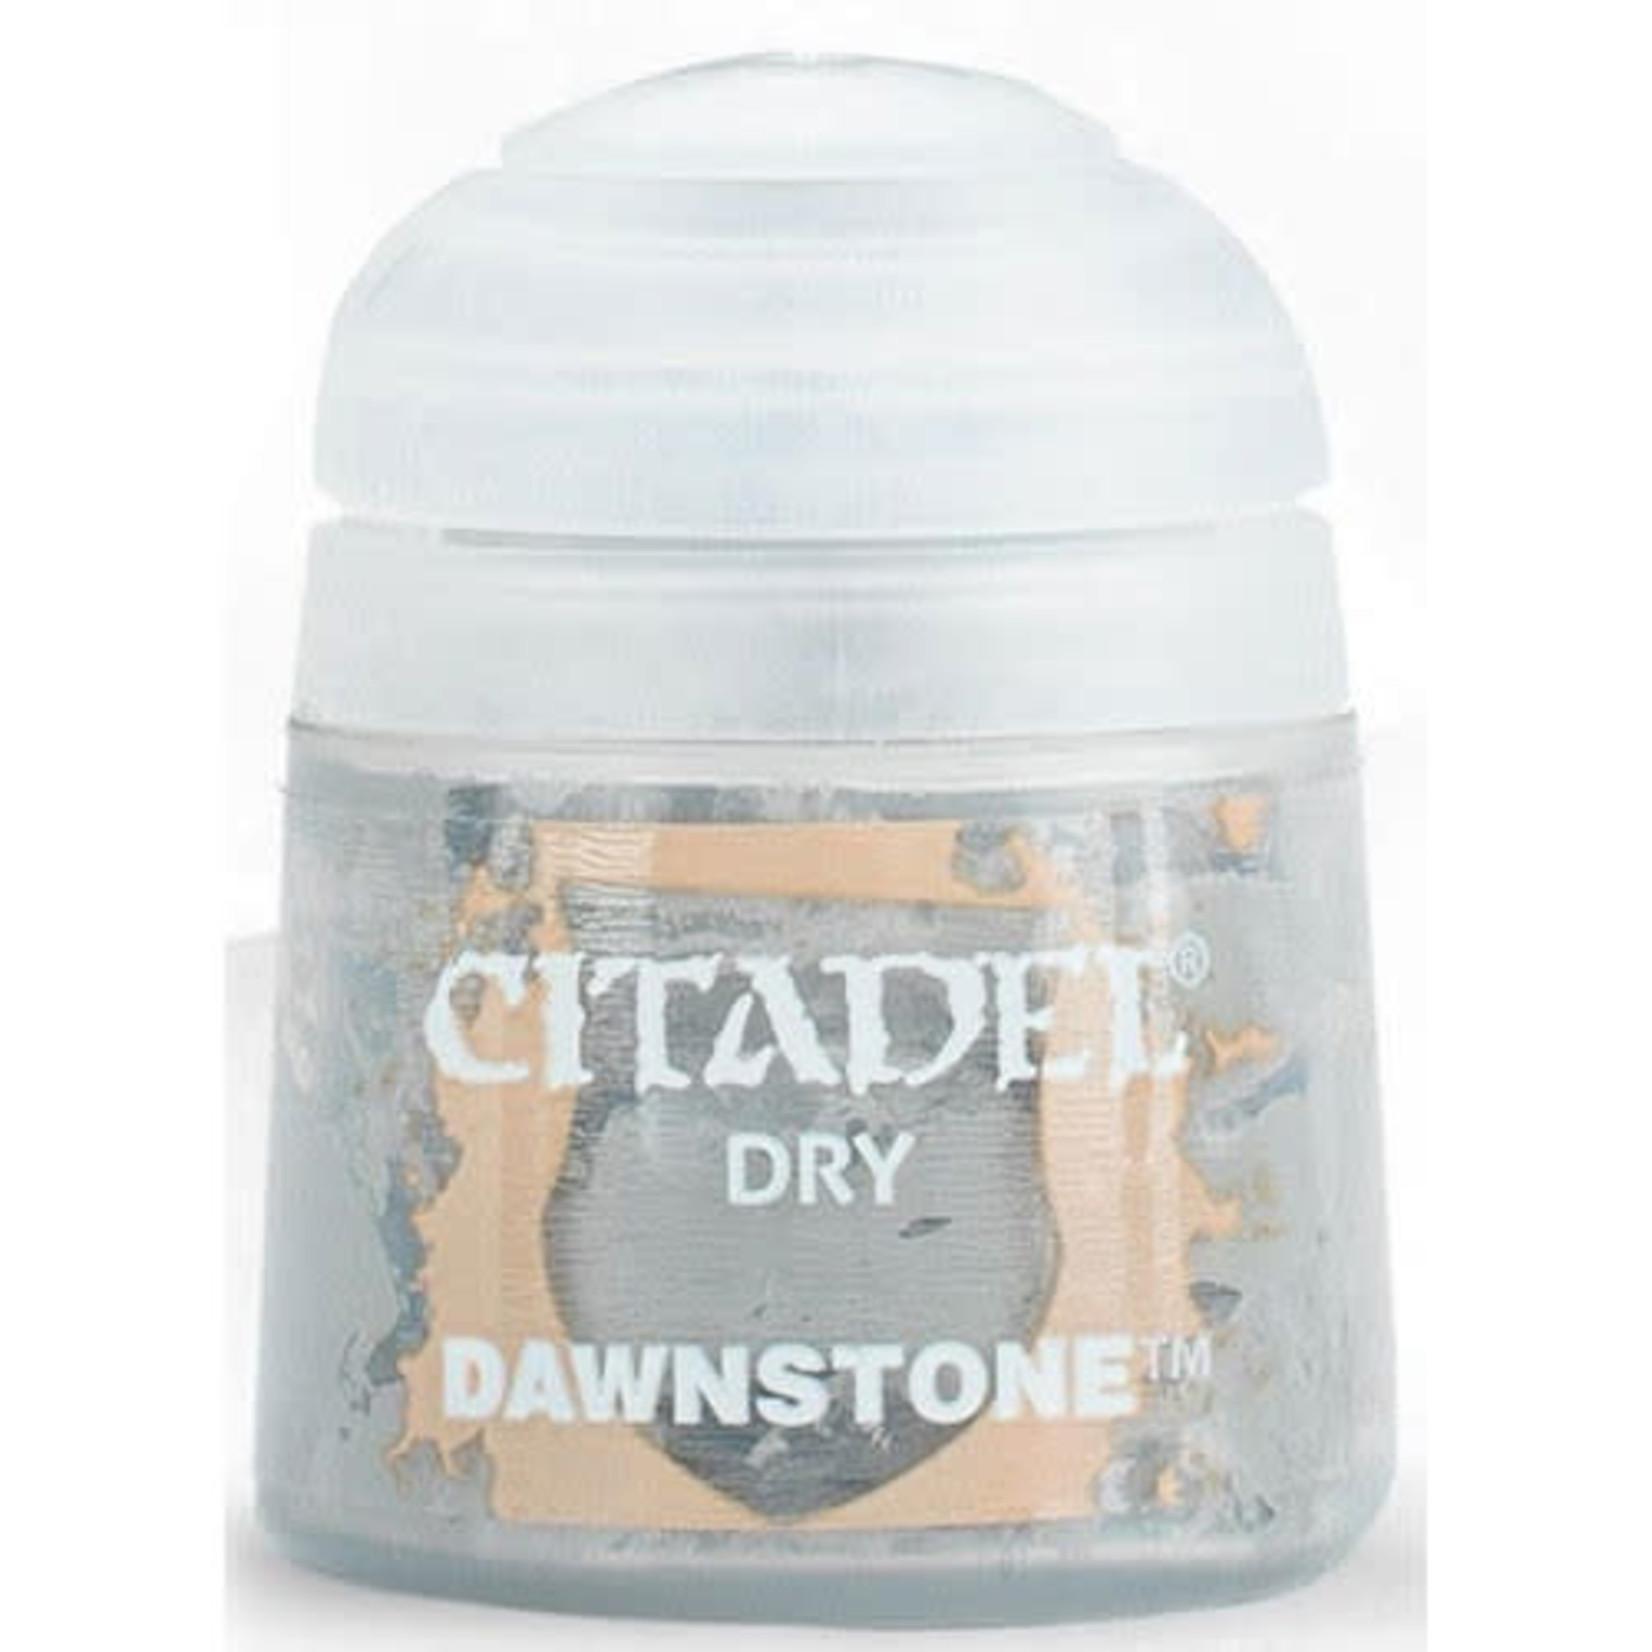 Citadel Citadel Paint - Layer: Dawnstone